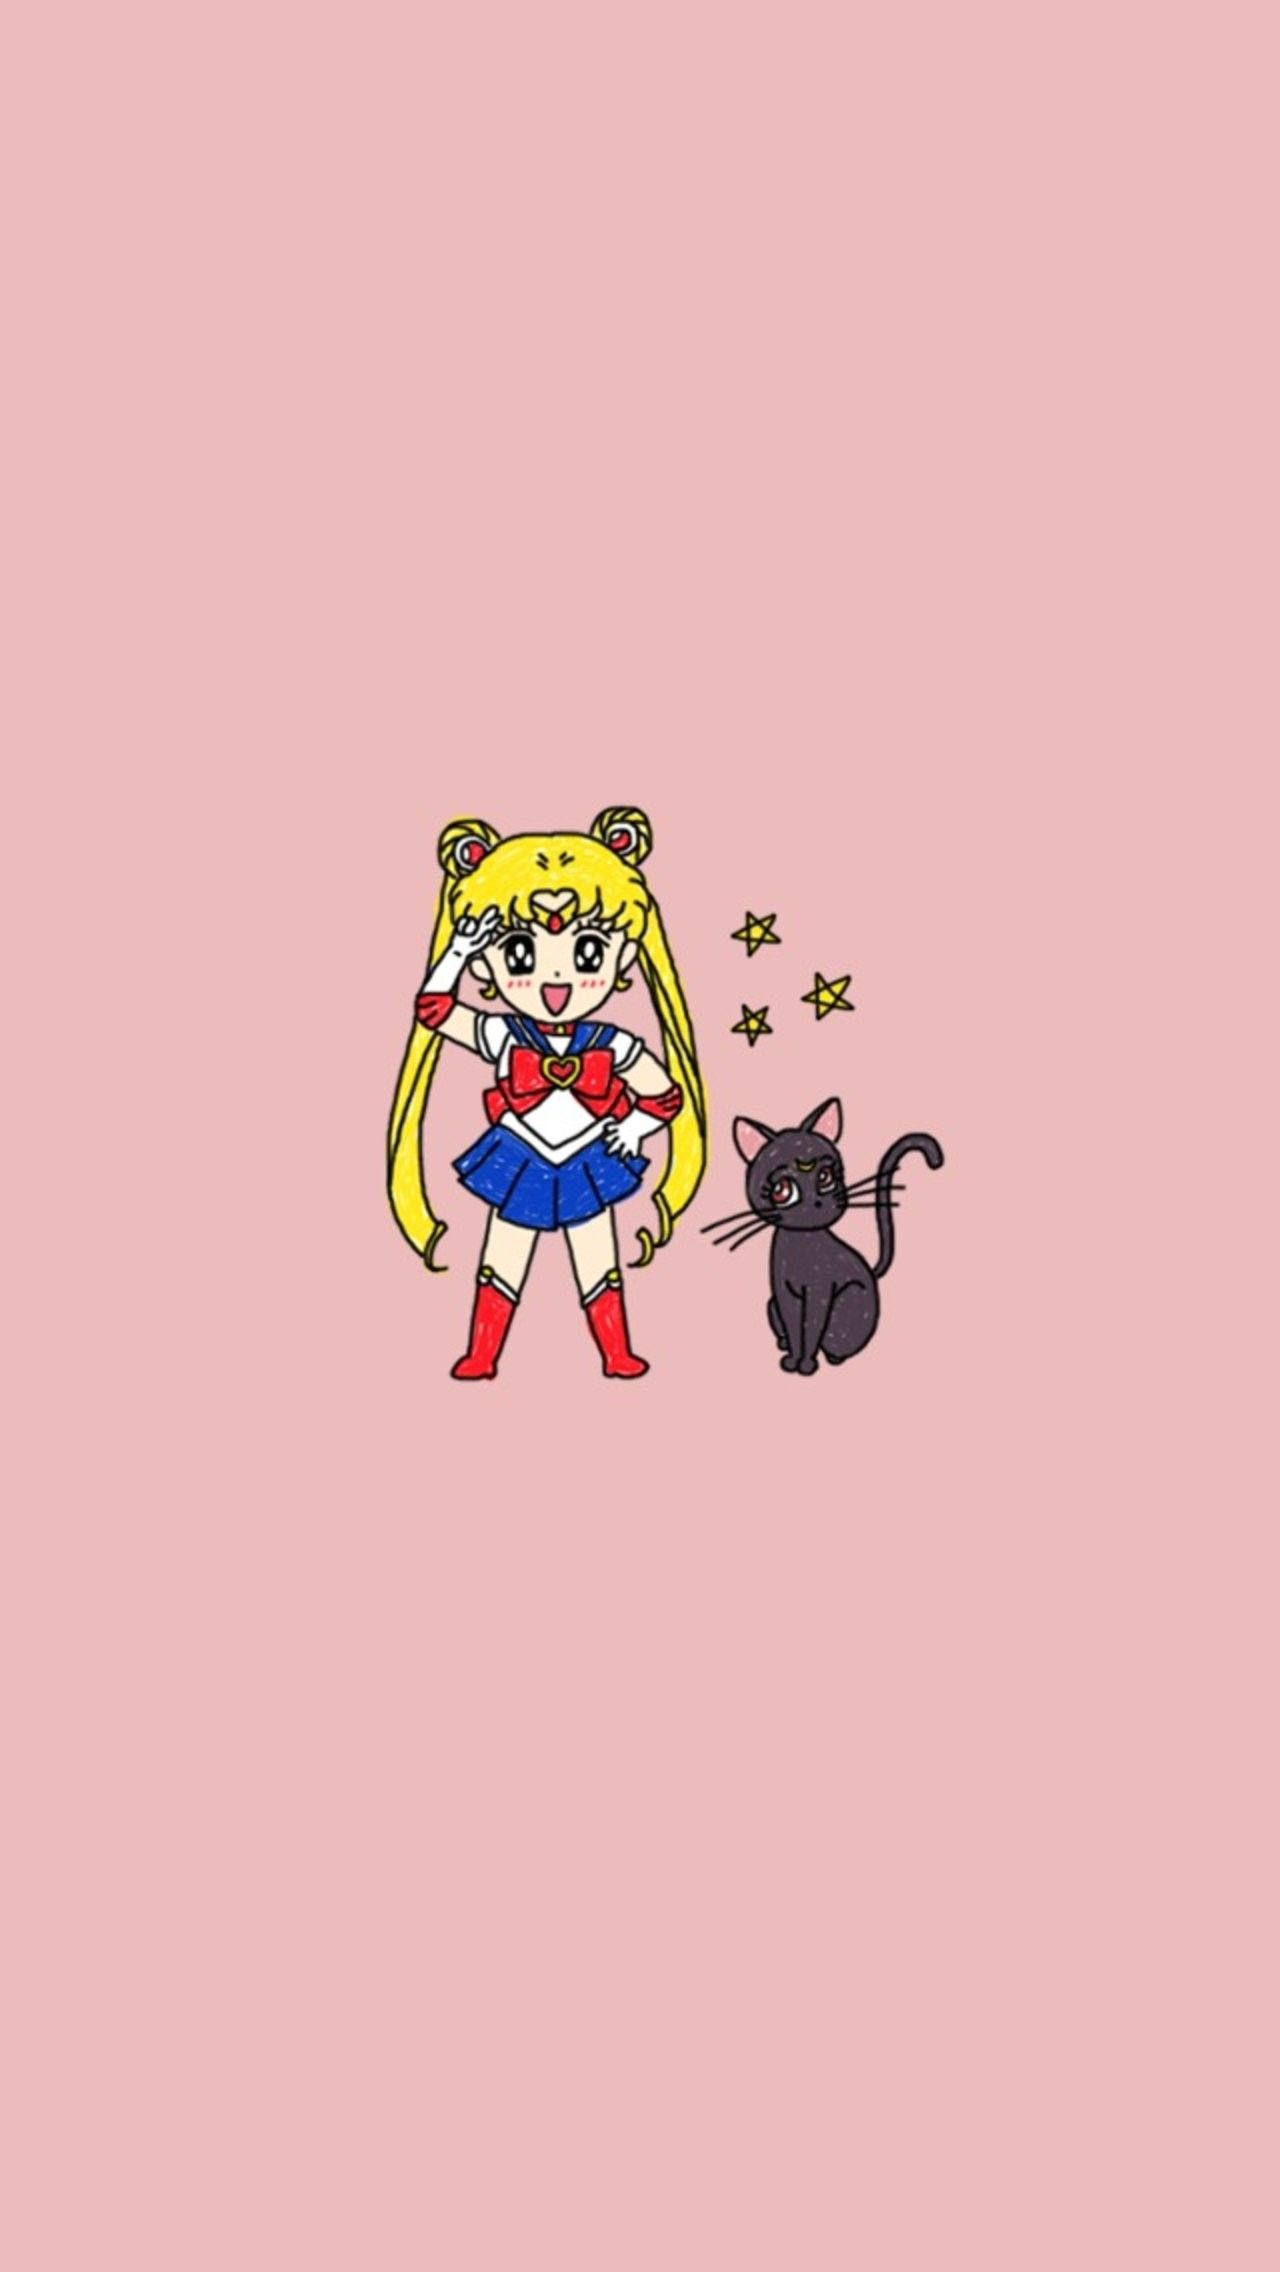 Iphone Aesthetic Lockscreen Sailor Moon Wallpaper Ipcwallpapers Sailor Moon Wallpaper Sailor Moon Sailor Moon Background